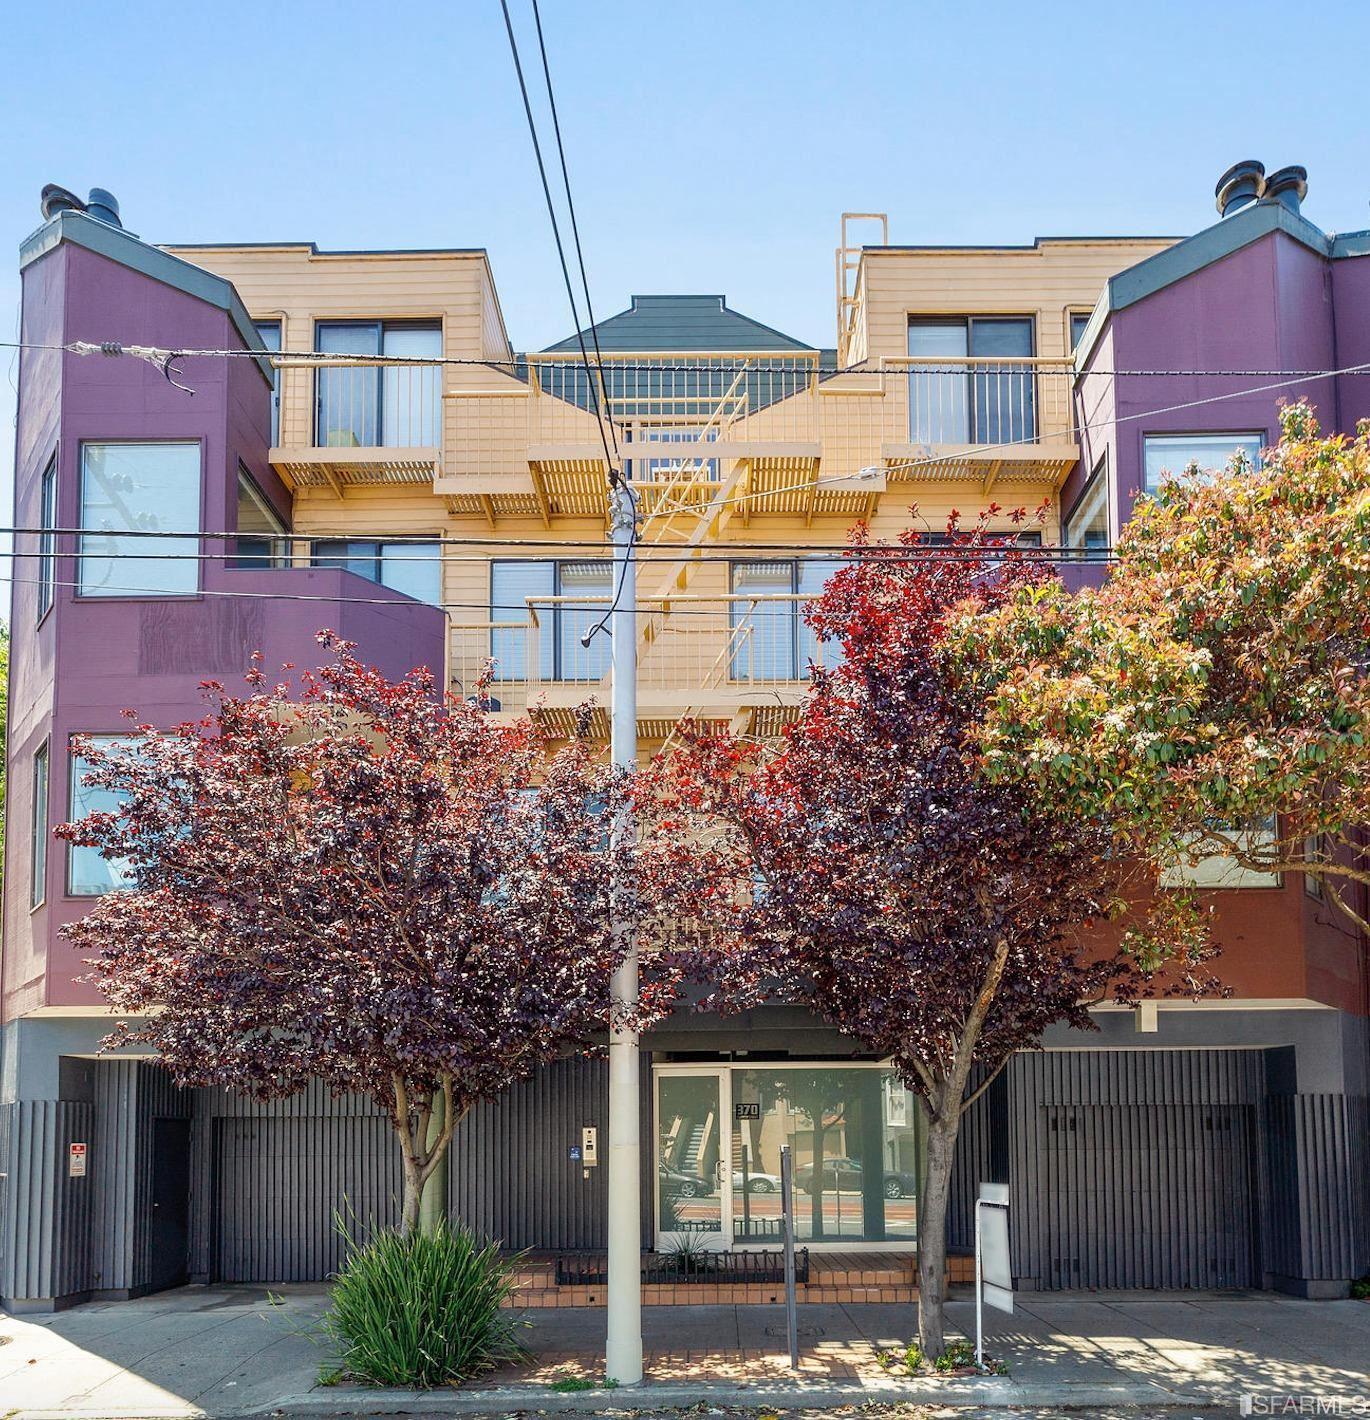 370 Church Street #F, San Francisco, CA 94114 - #: 421557527